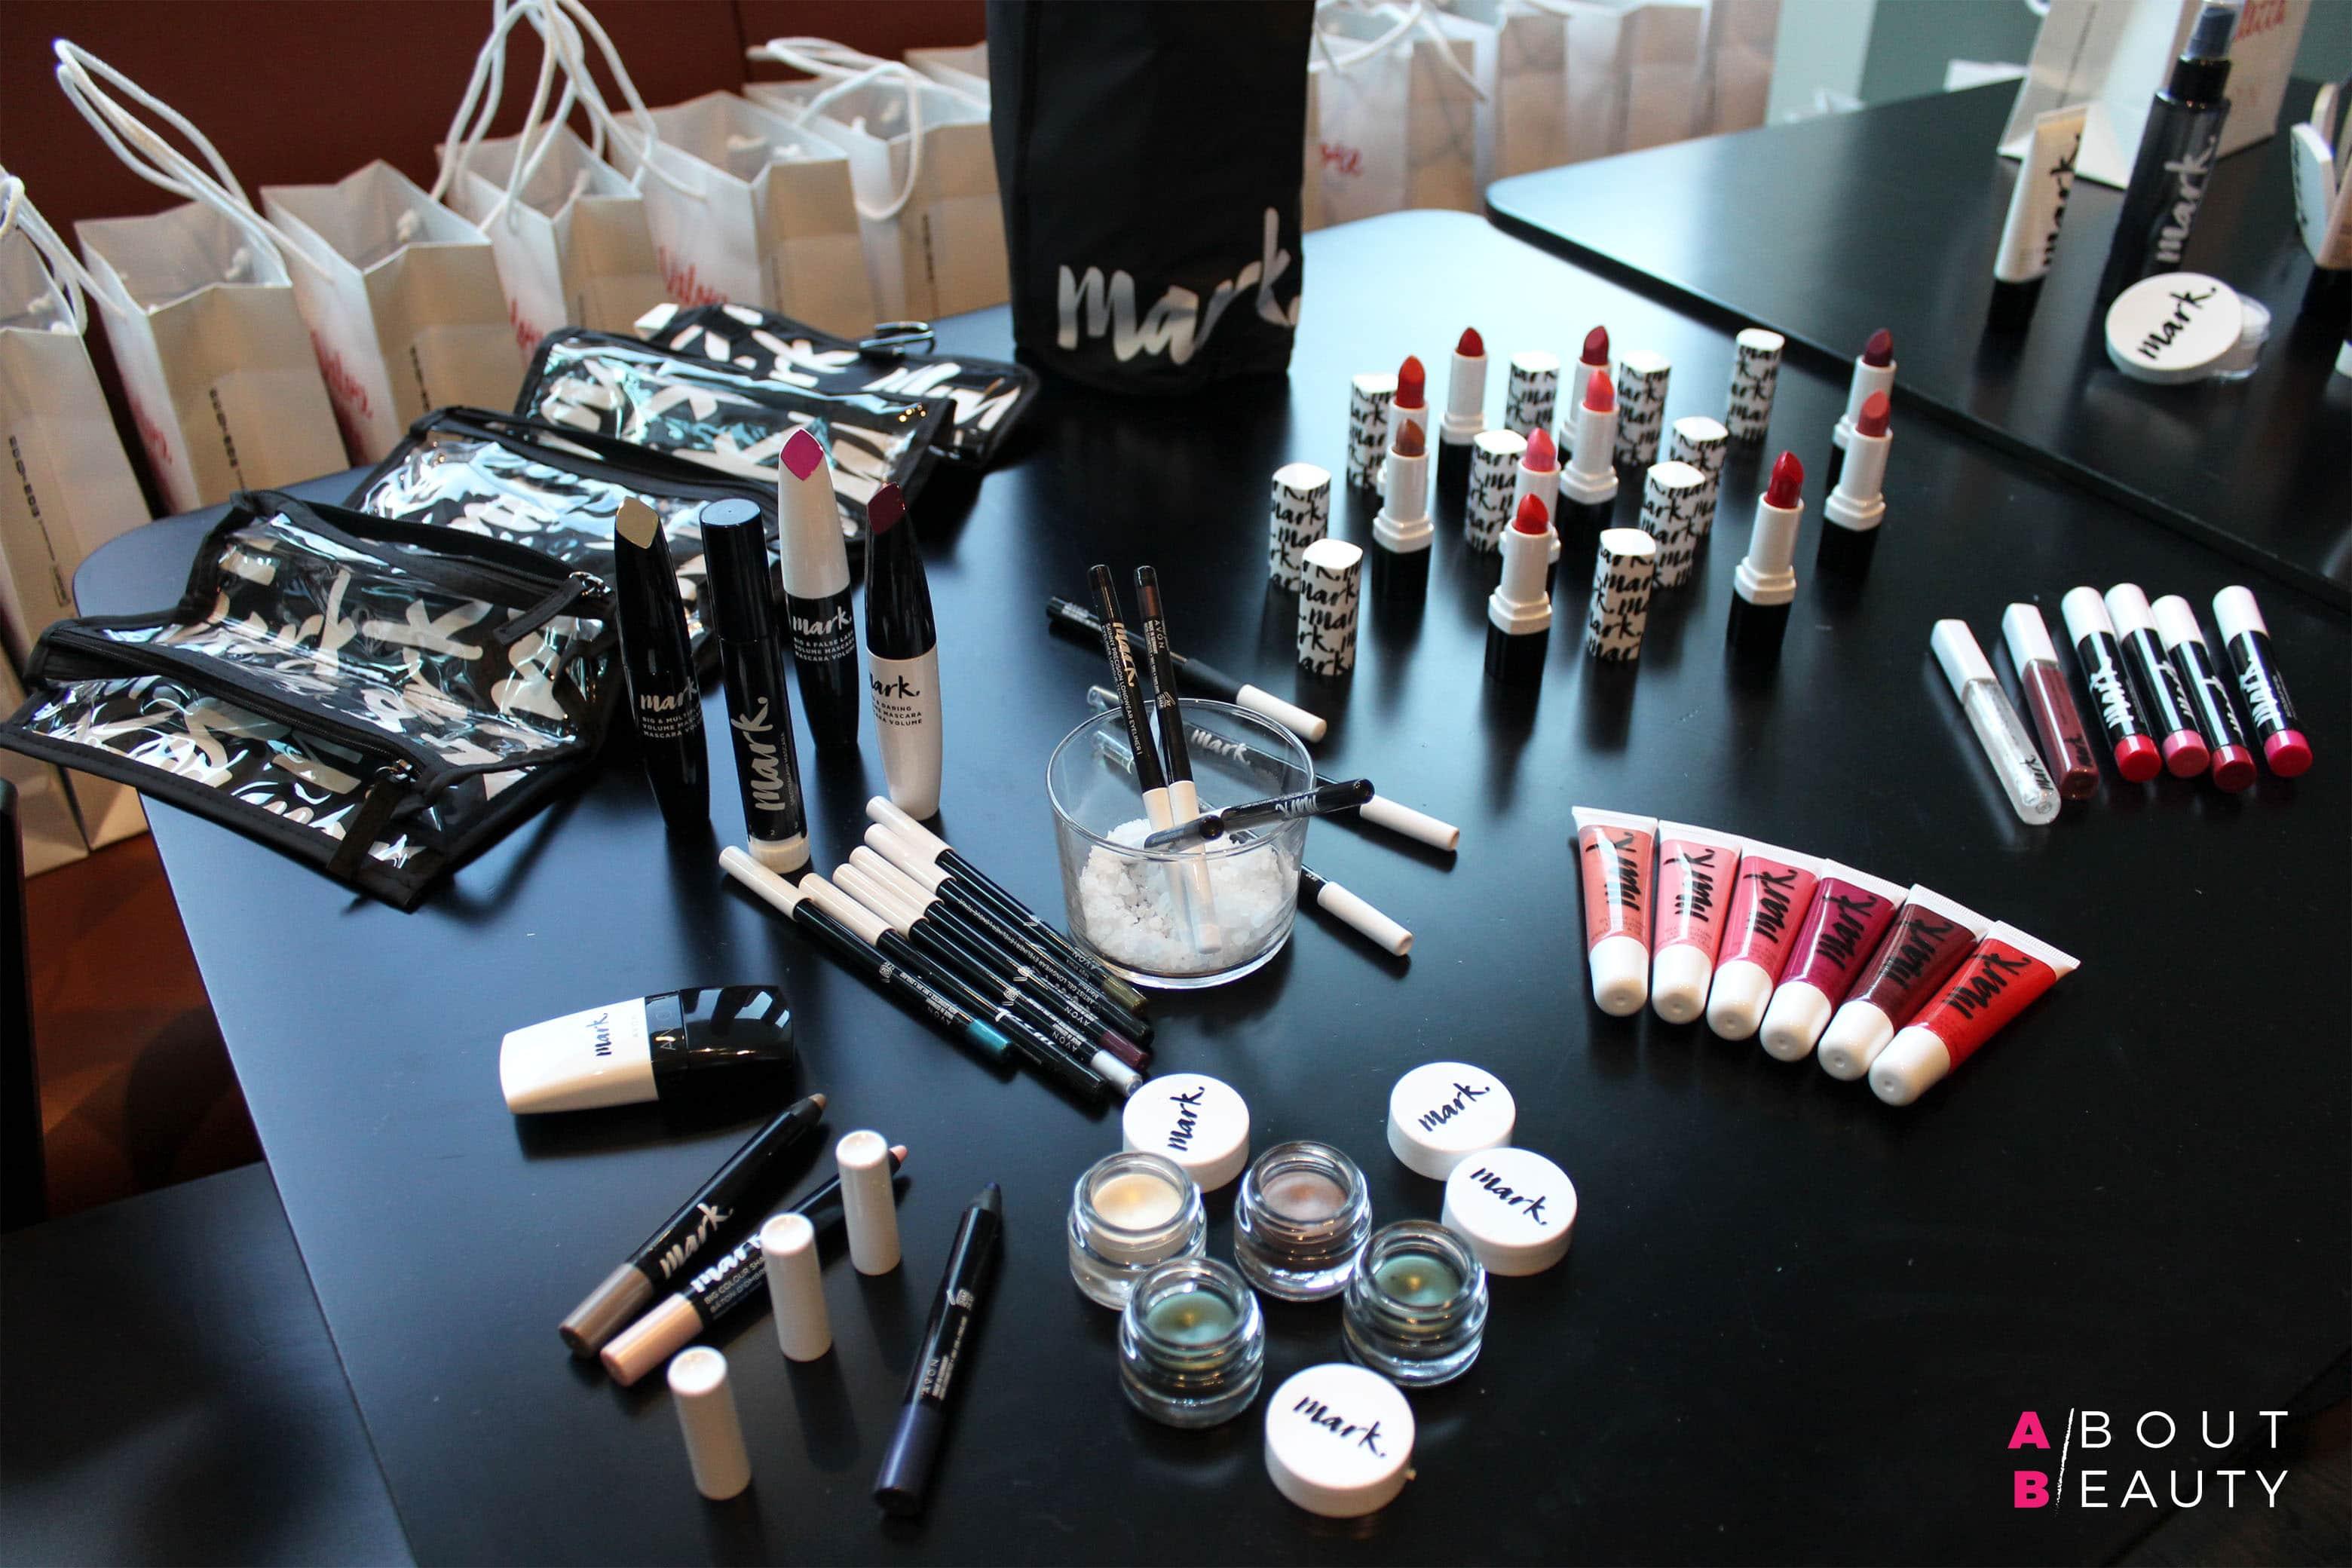 Avon Mark, i prodotti occhi e labbra